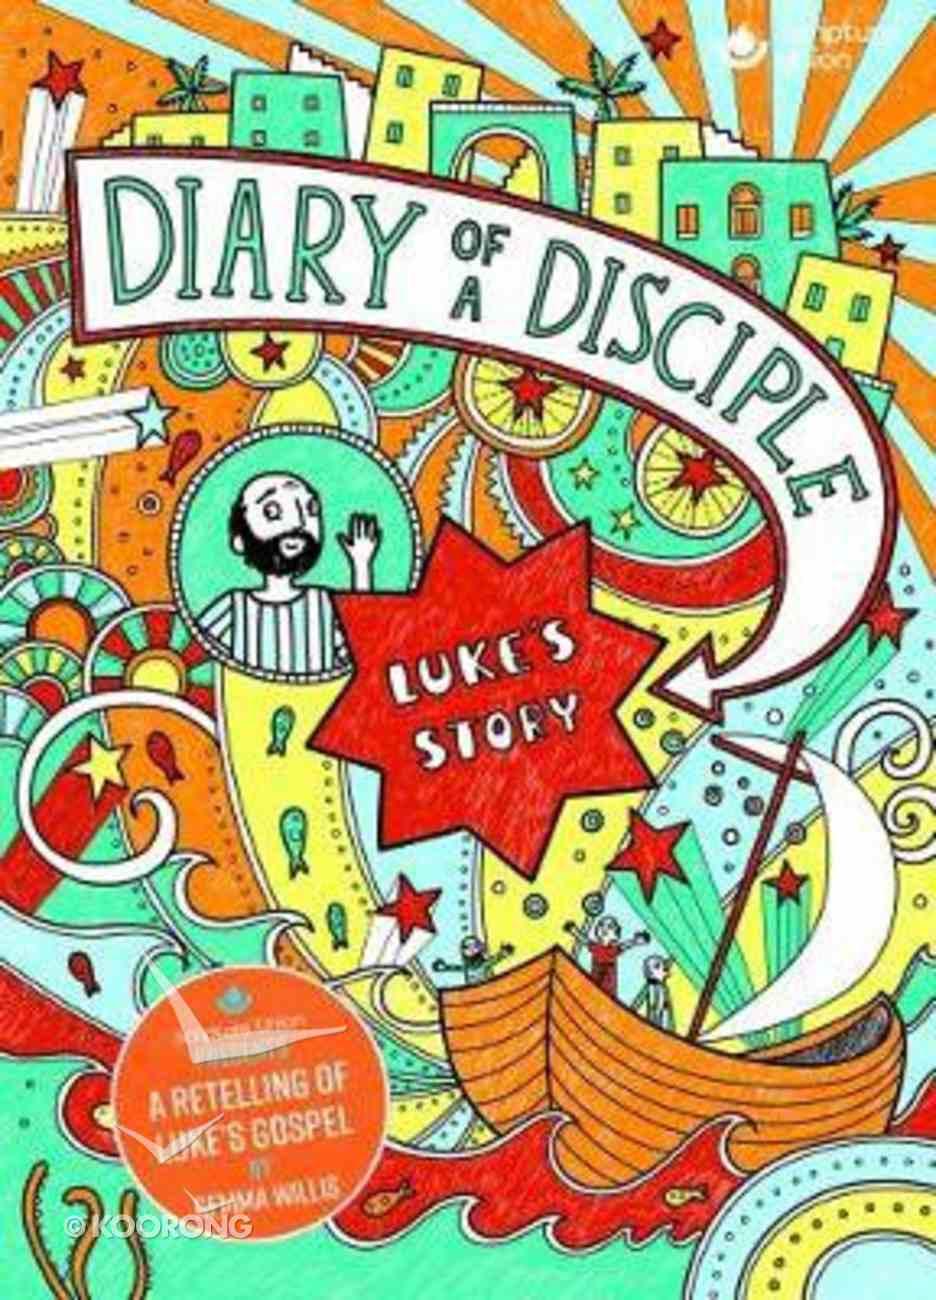 Diary of a Disciple: Luke's Story (Illustrated) Hardback